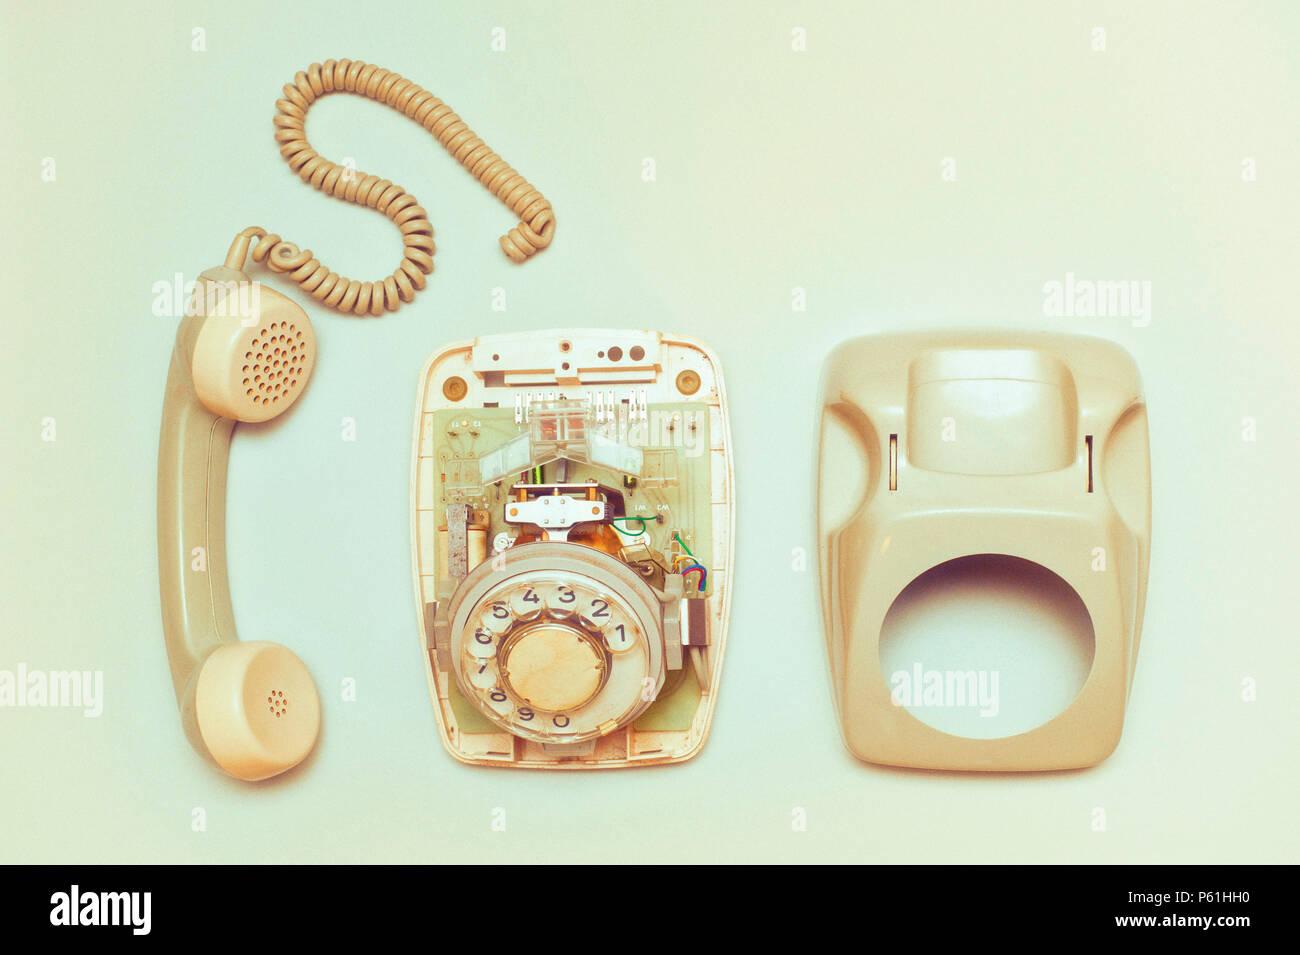 vintage rotary dial telephone taken apart - Stock Image